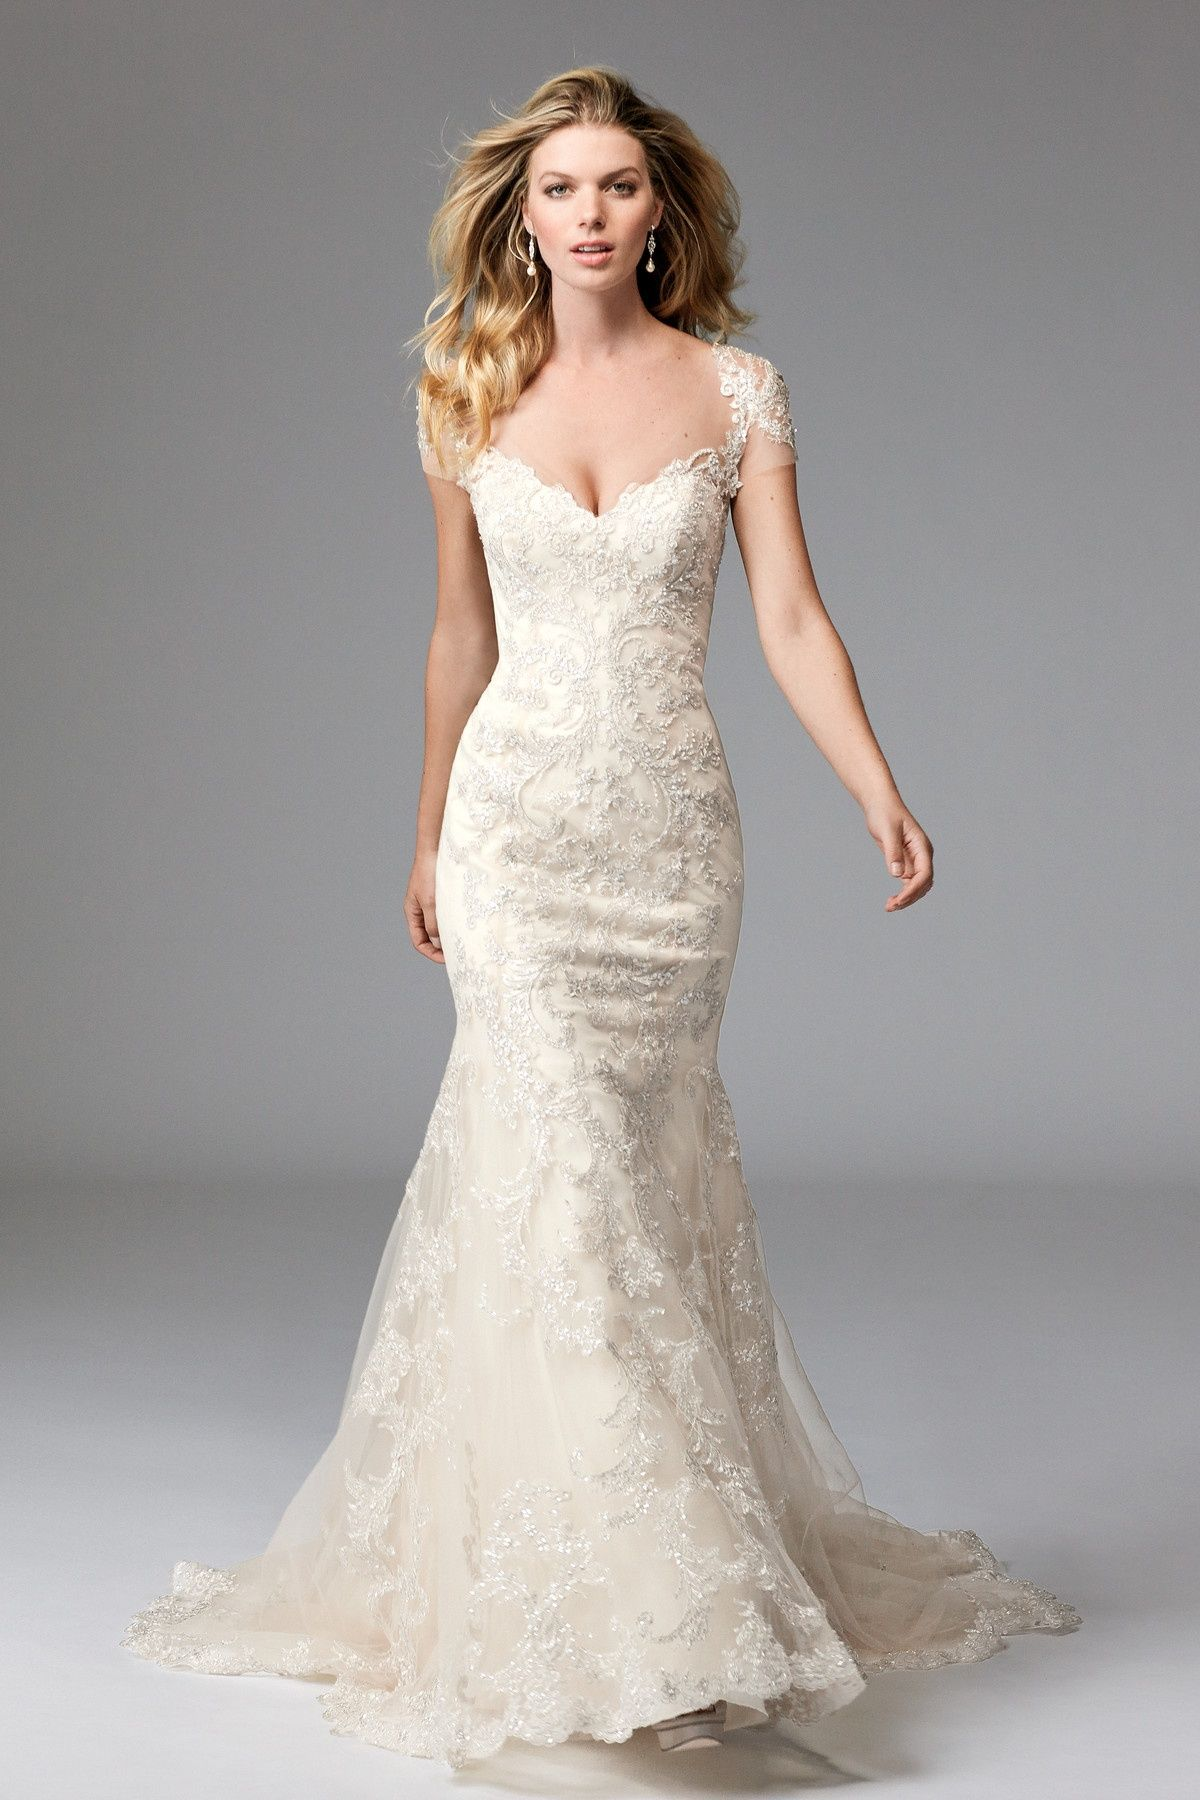 Marah\'s Elegant Bridal: Sadie Style 17721, WToo | WEDDING} Dresses ...